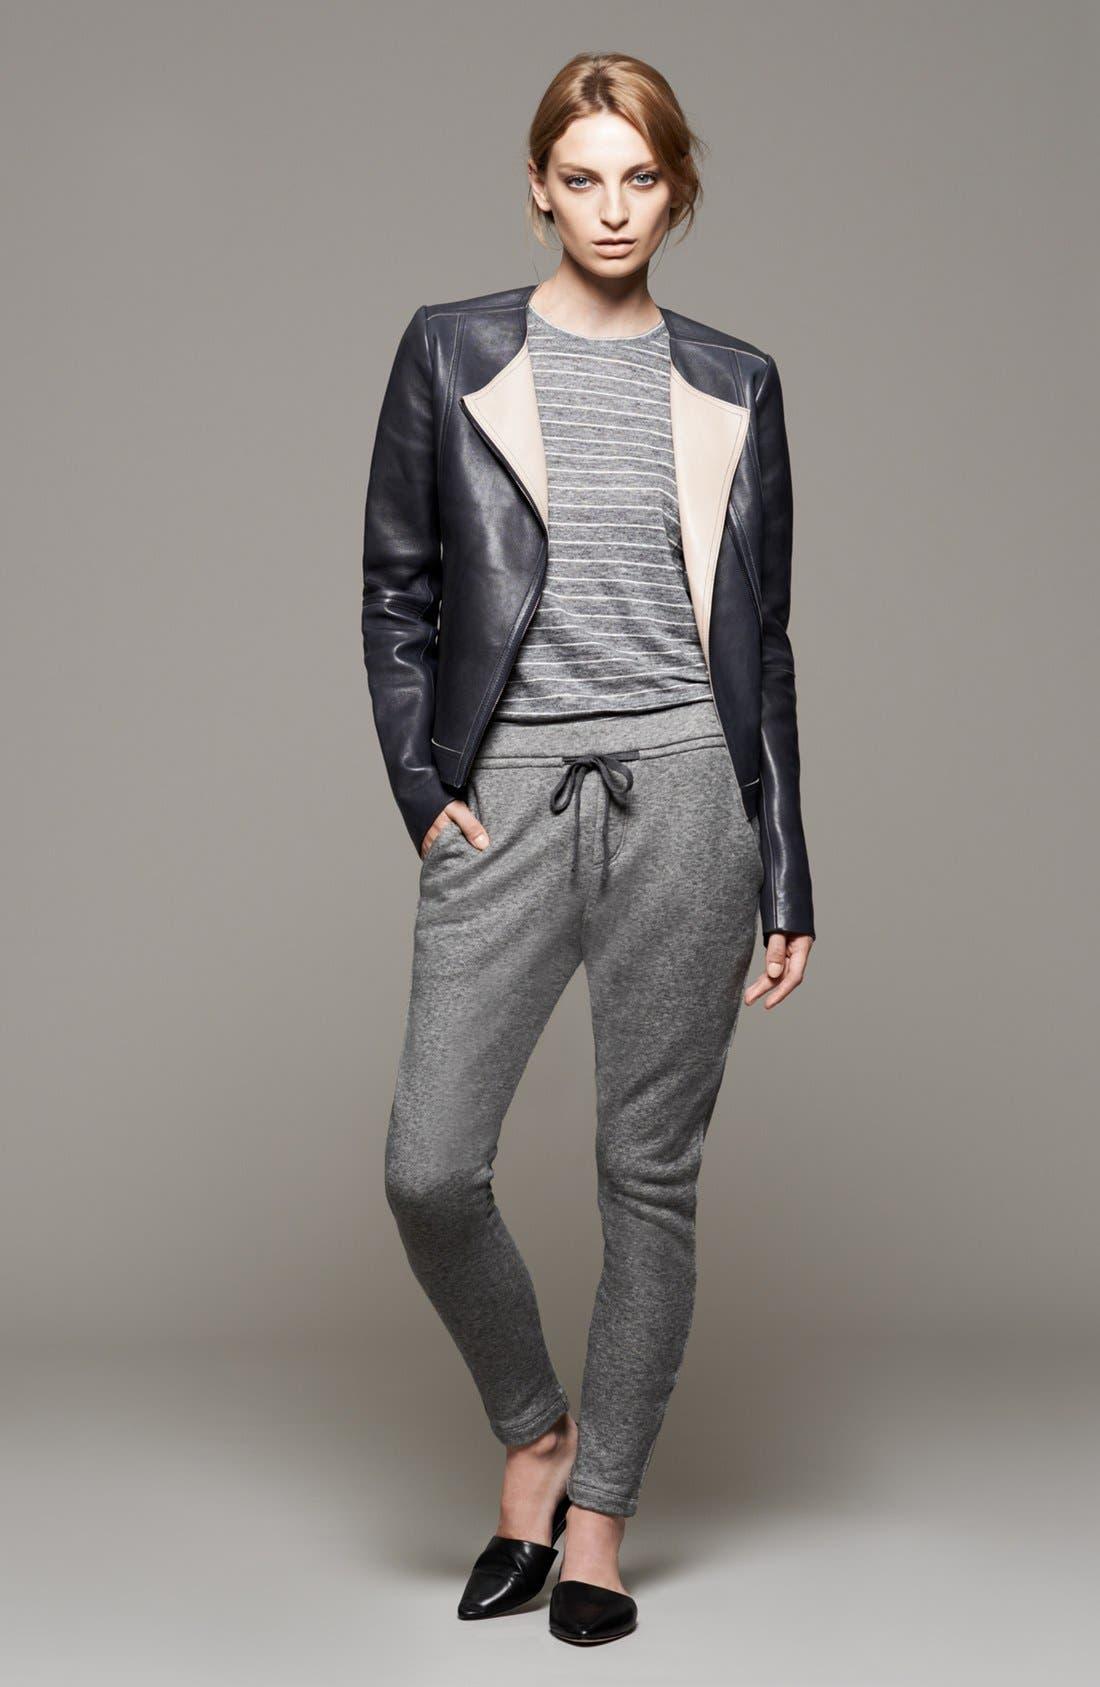 Alternate Image 1 Selected - Vince Leather Jacket, Tee & Sweatpants